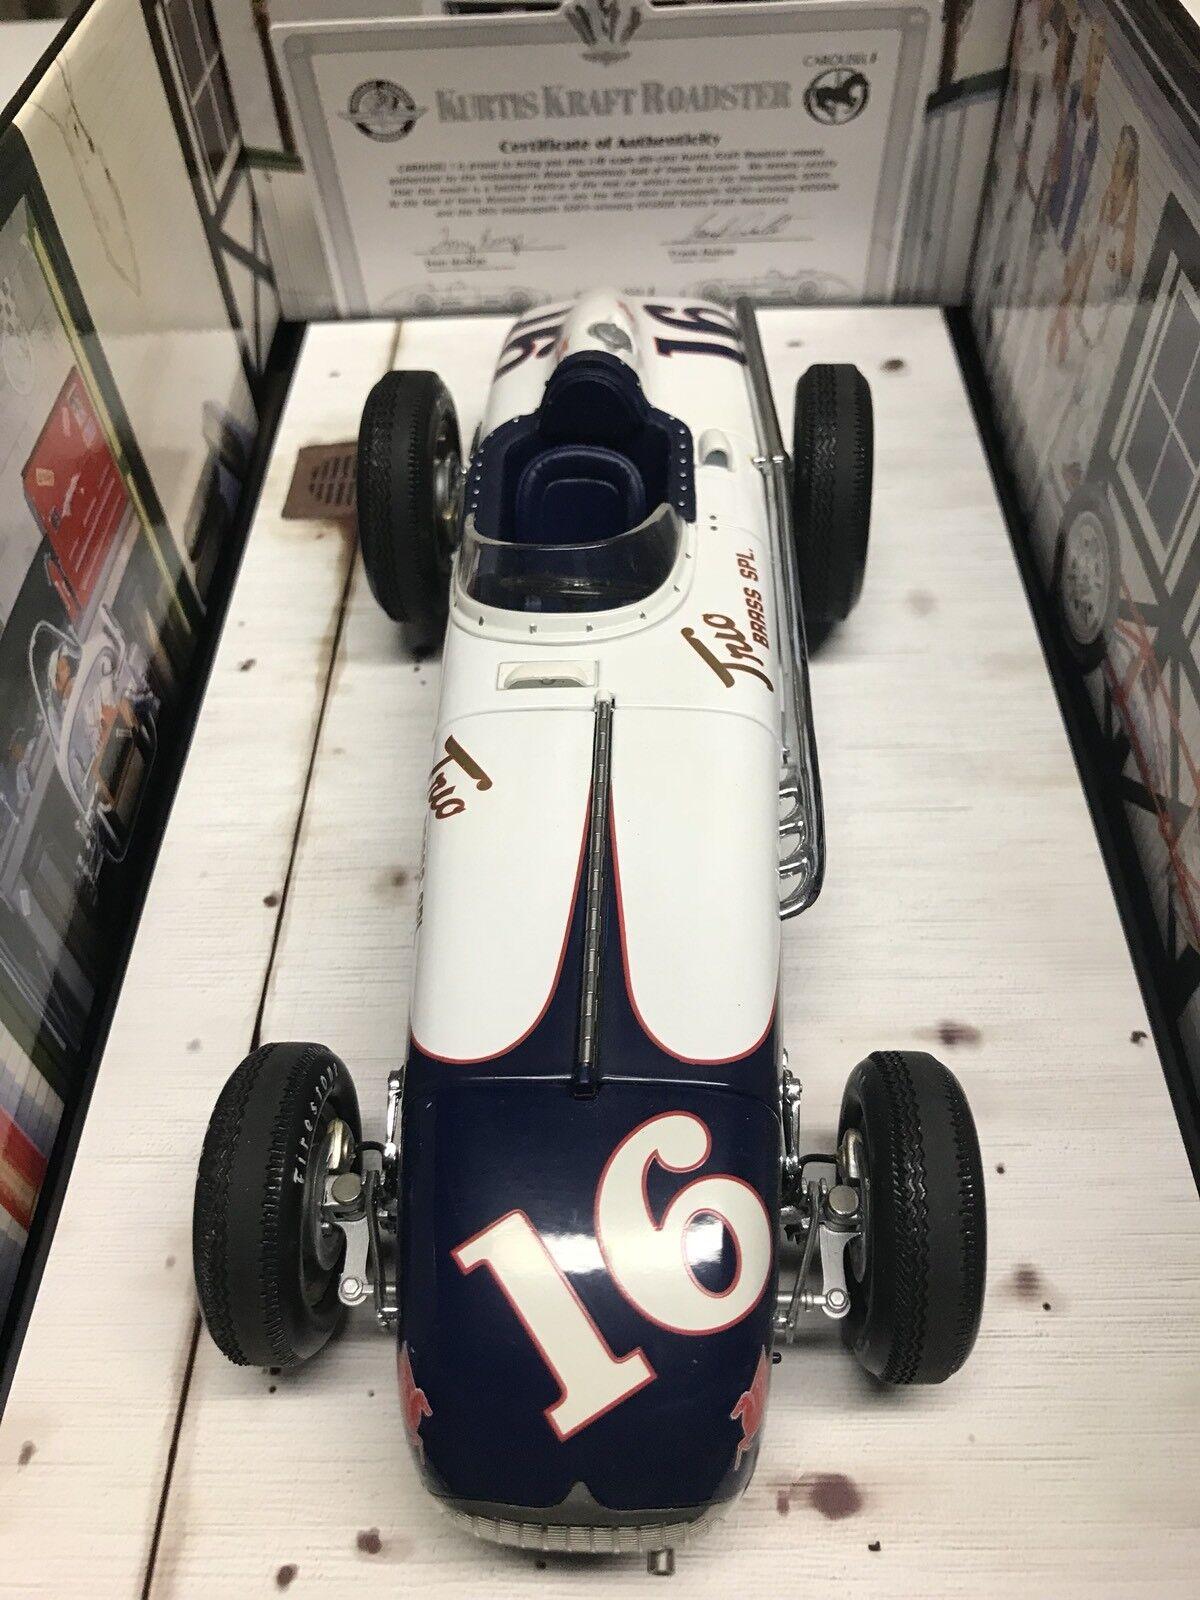 Carousel 1 Johnnie Parsons trío de latón Kurtis Kraft 1955 Indy 500  18 +